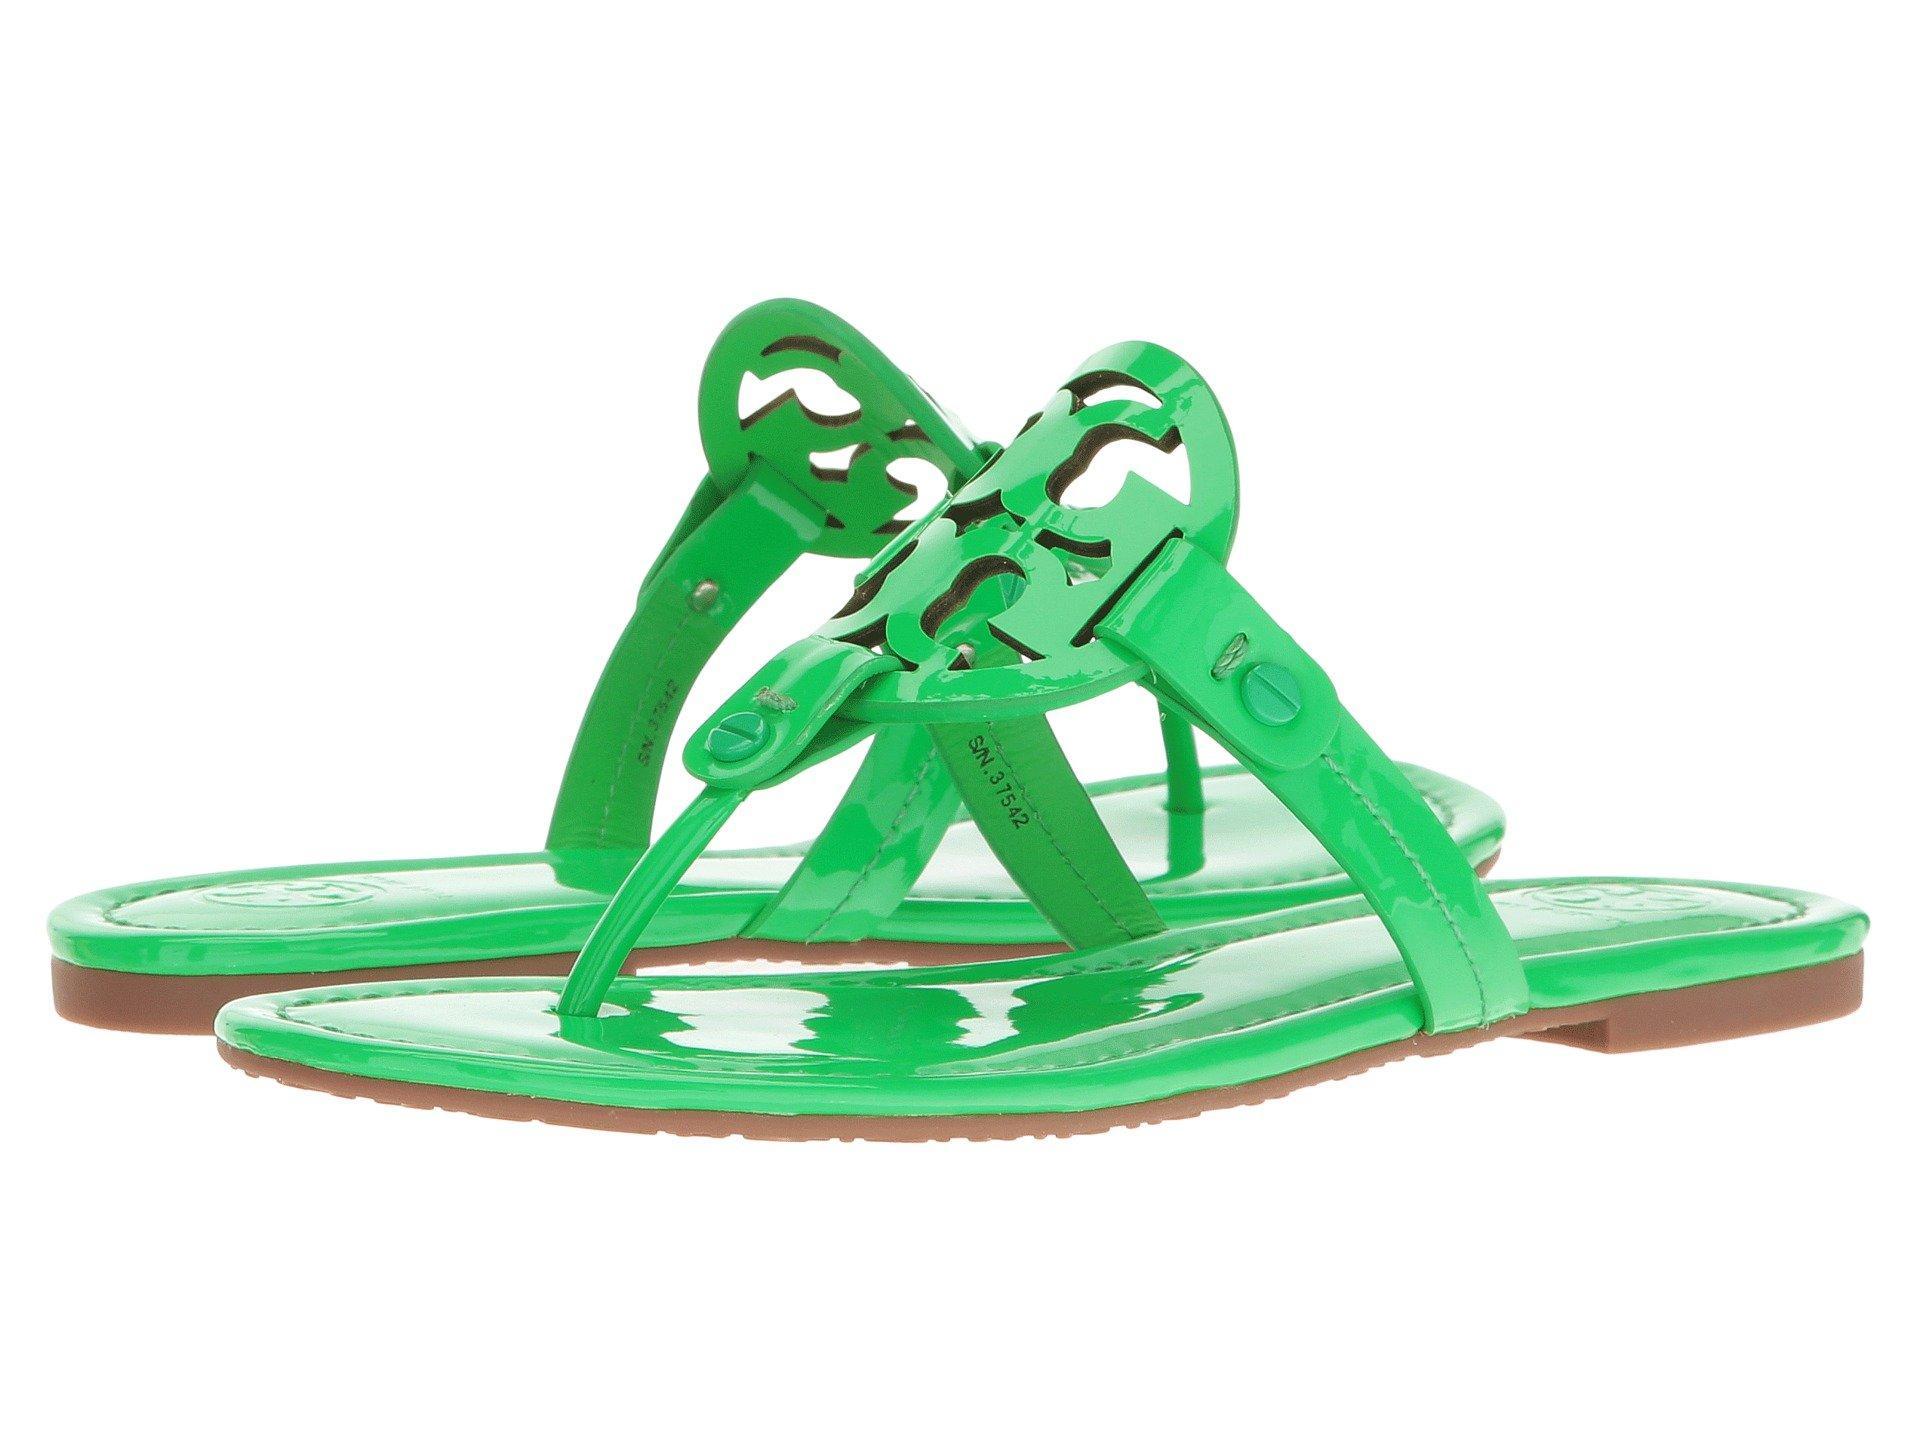 d5b7f7ce0075 Tory Burch Miller Flip Flop Sandal In Fluo Green